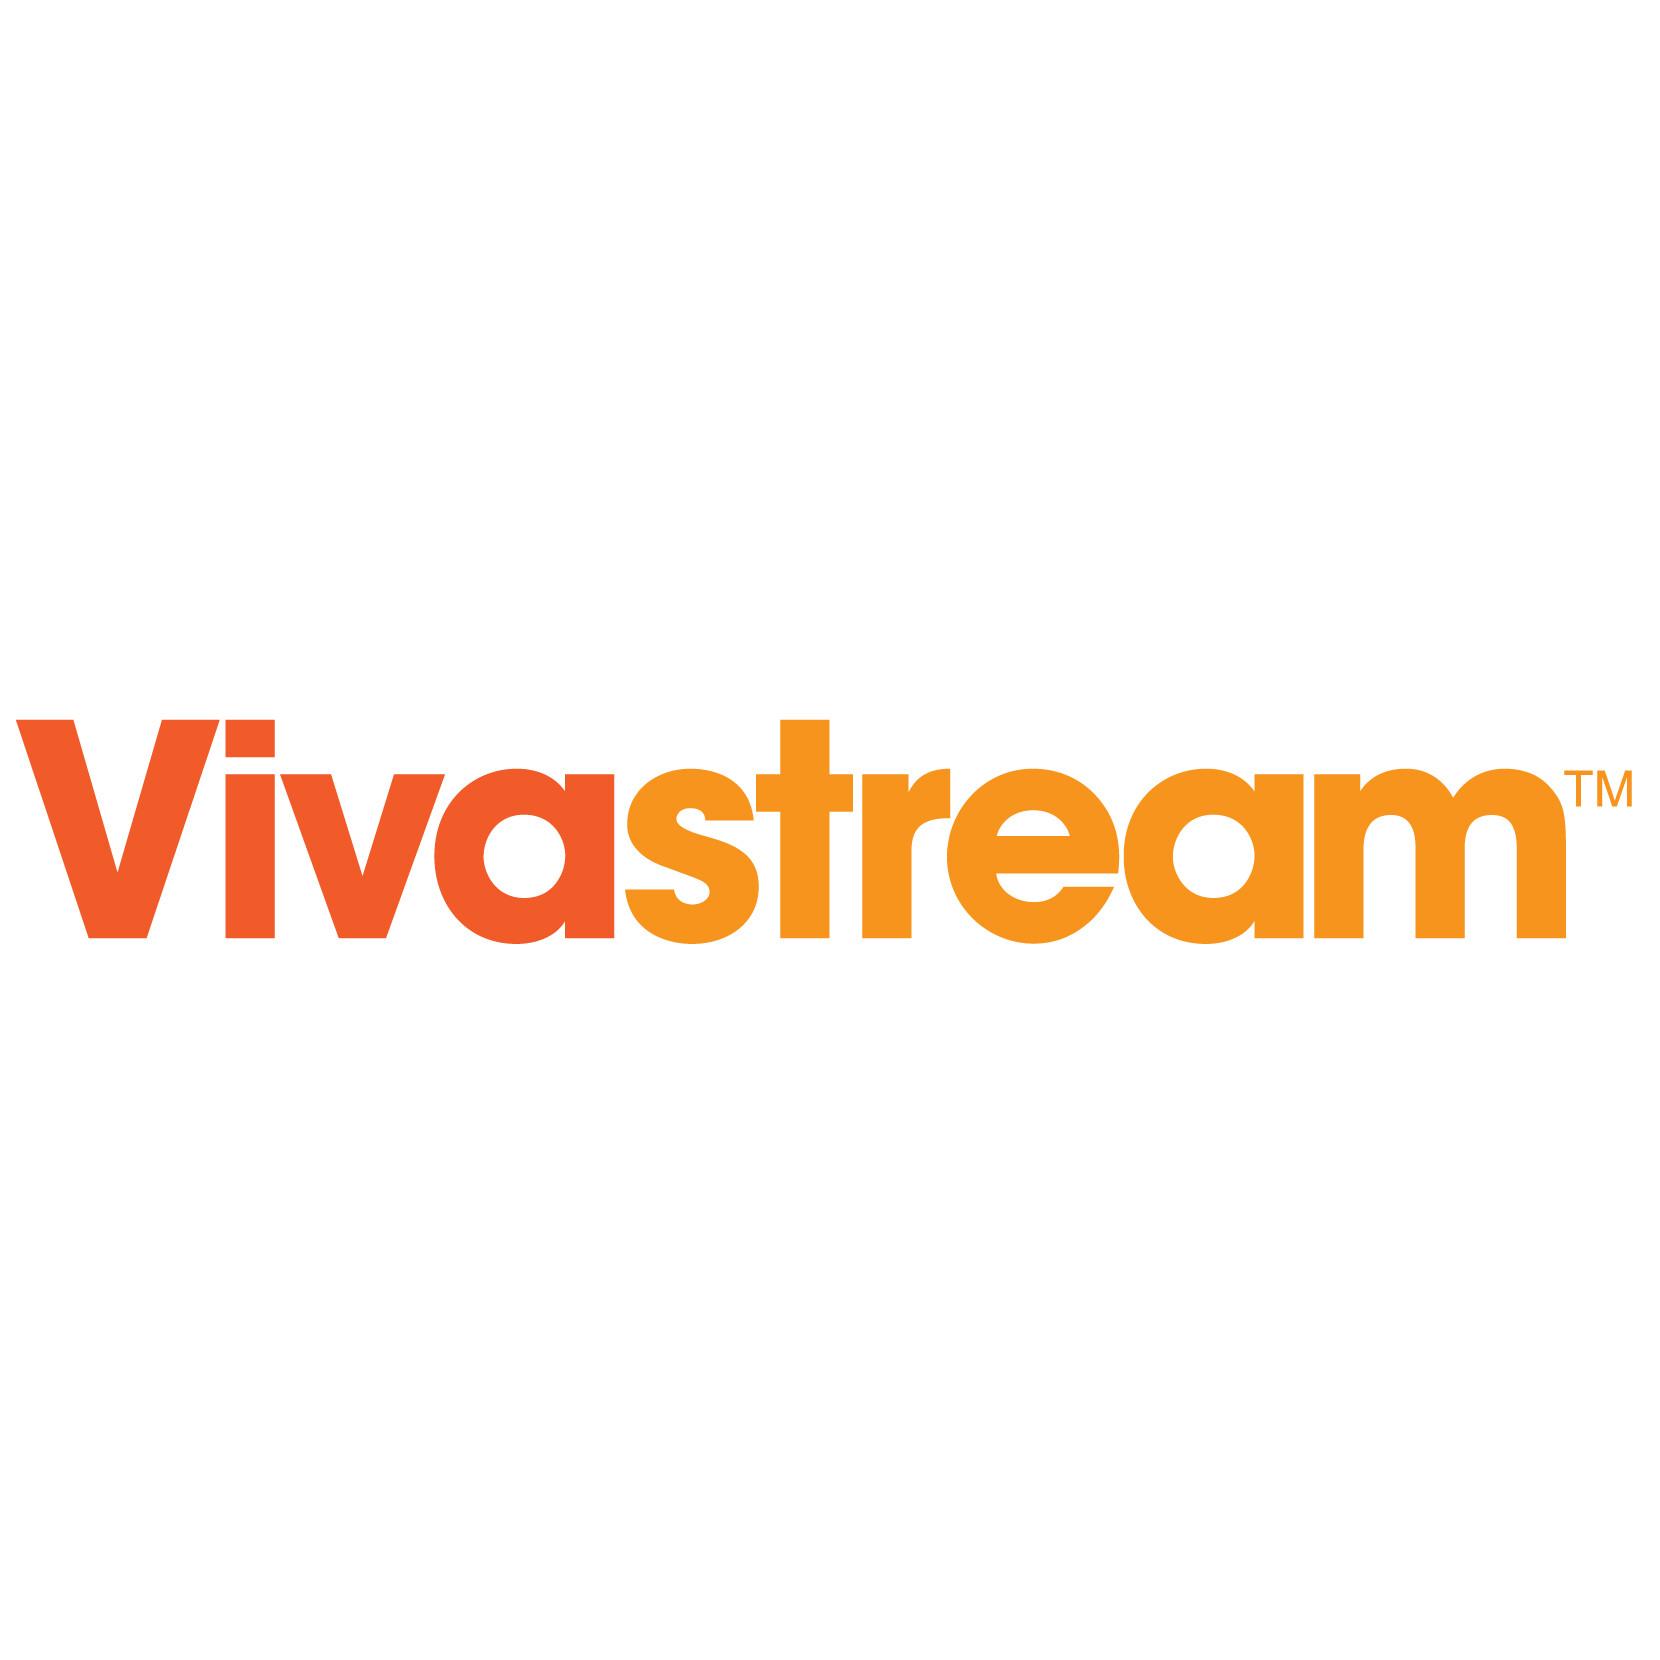 Vivastream™